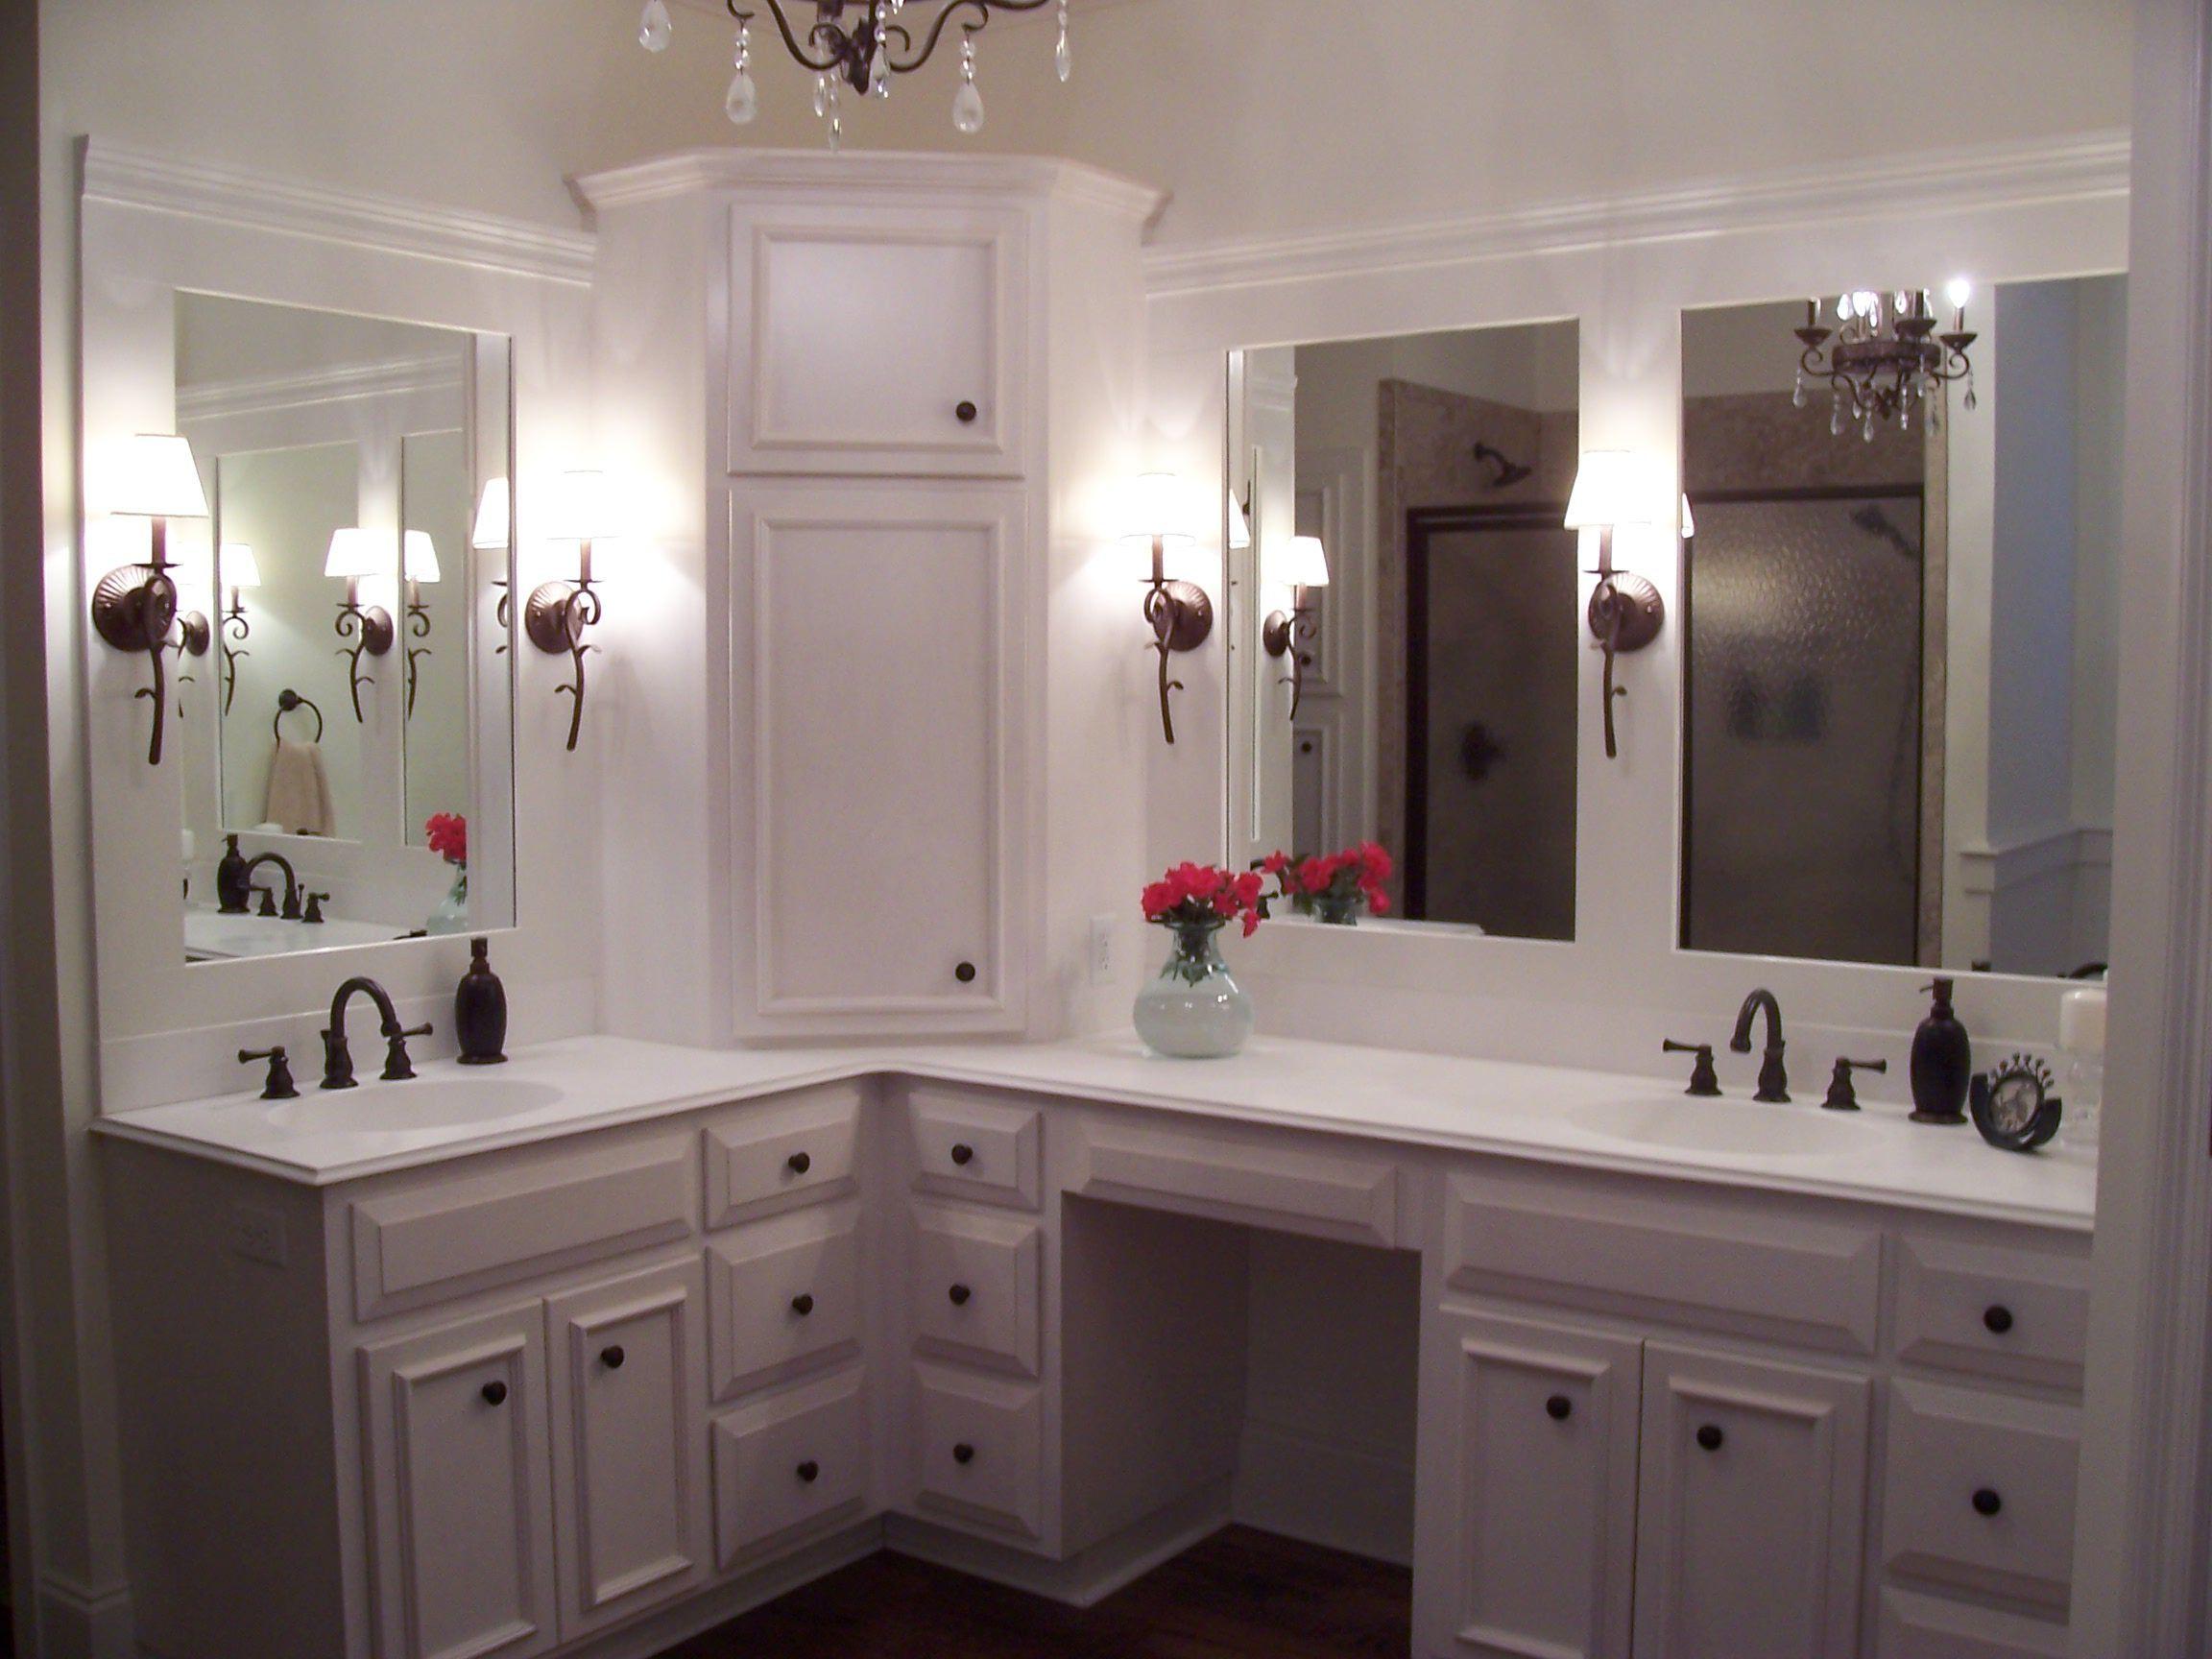 Pin On Dream Bathroom Ideas